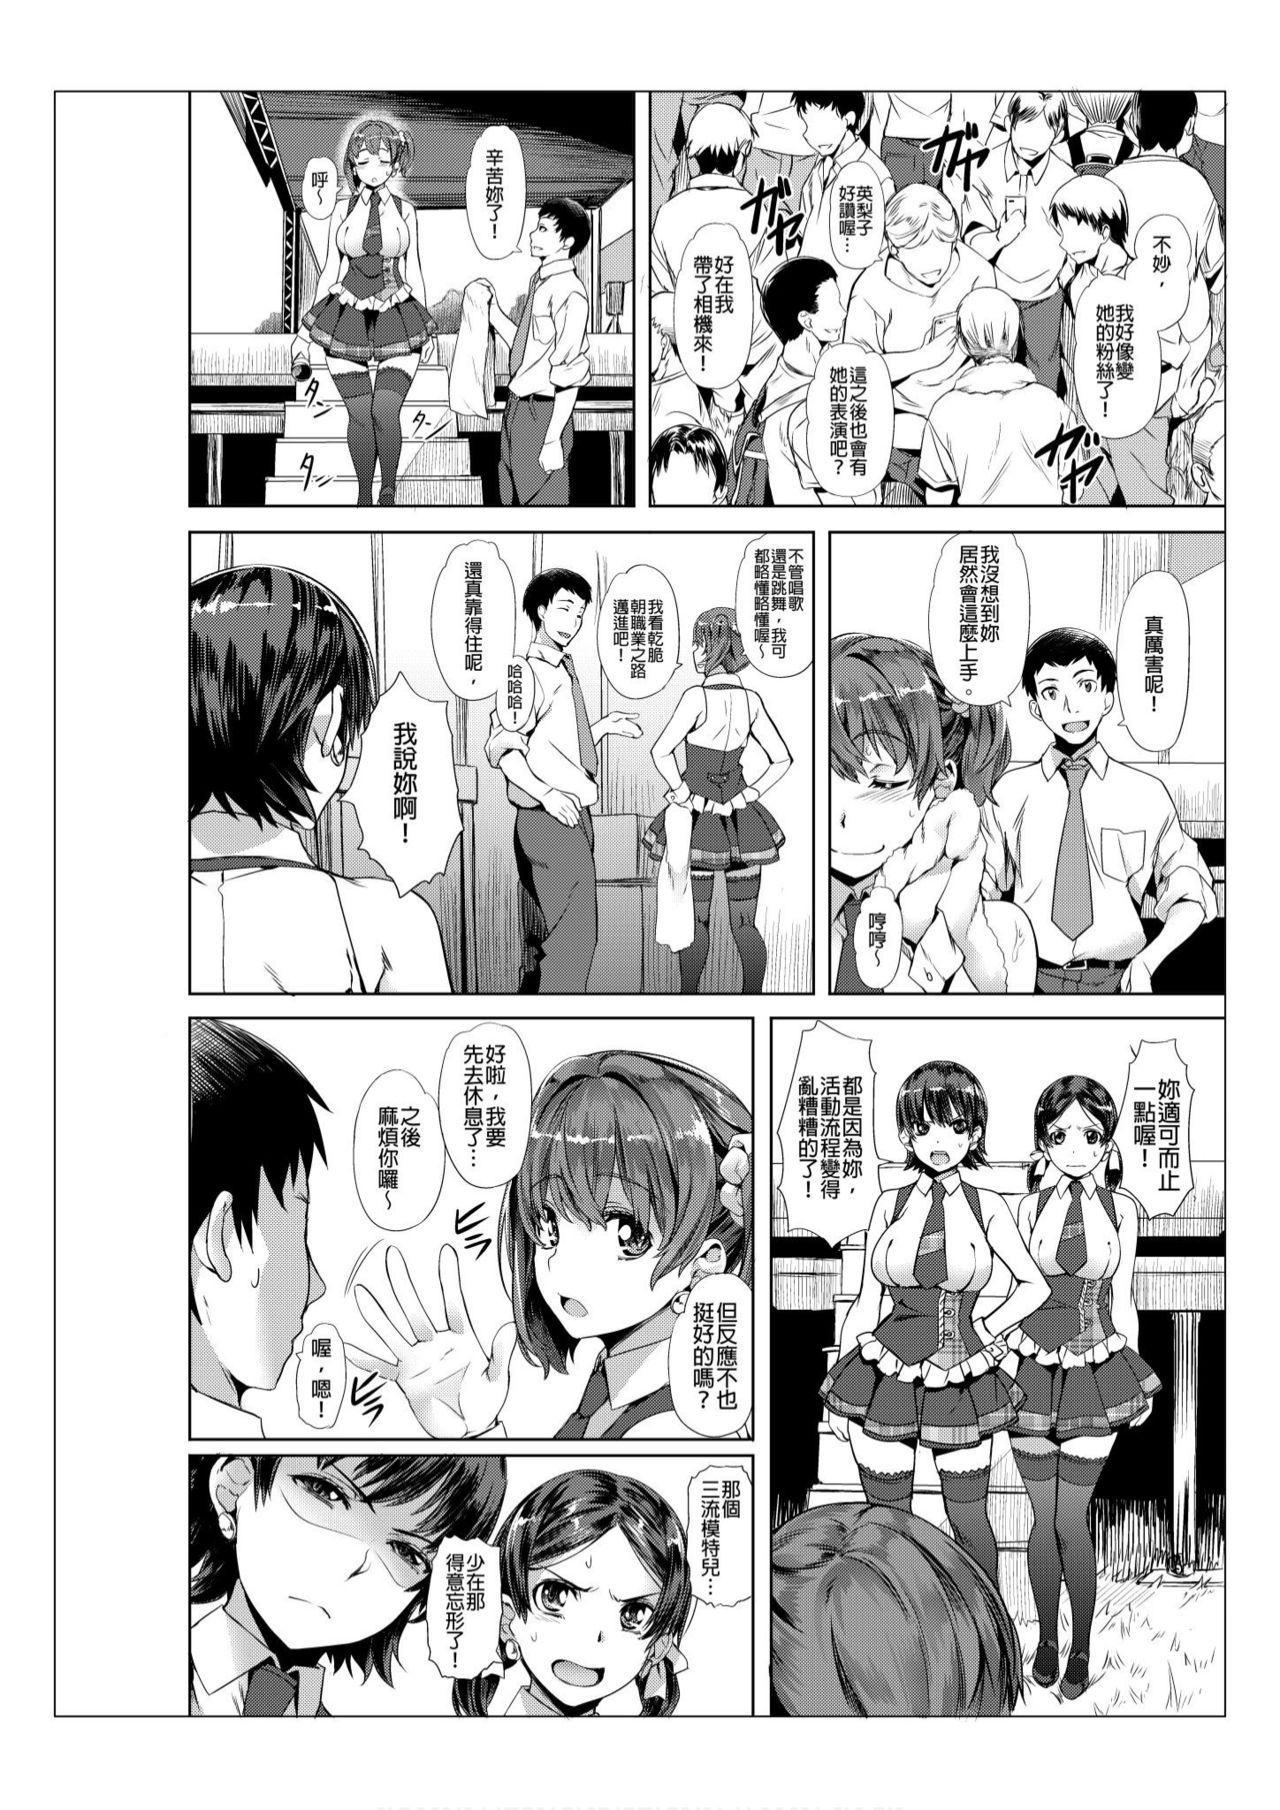 [Nagayori] Towel Ichimai de Otoko Buro.~ Shiranai Ojisan-tachi to Honiki Sex ~ | 只裹了條小毛巾就進男浴池的我。~被完全不認識的大叔們弄到高潮了~ [Chinese] [Decensored] 33